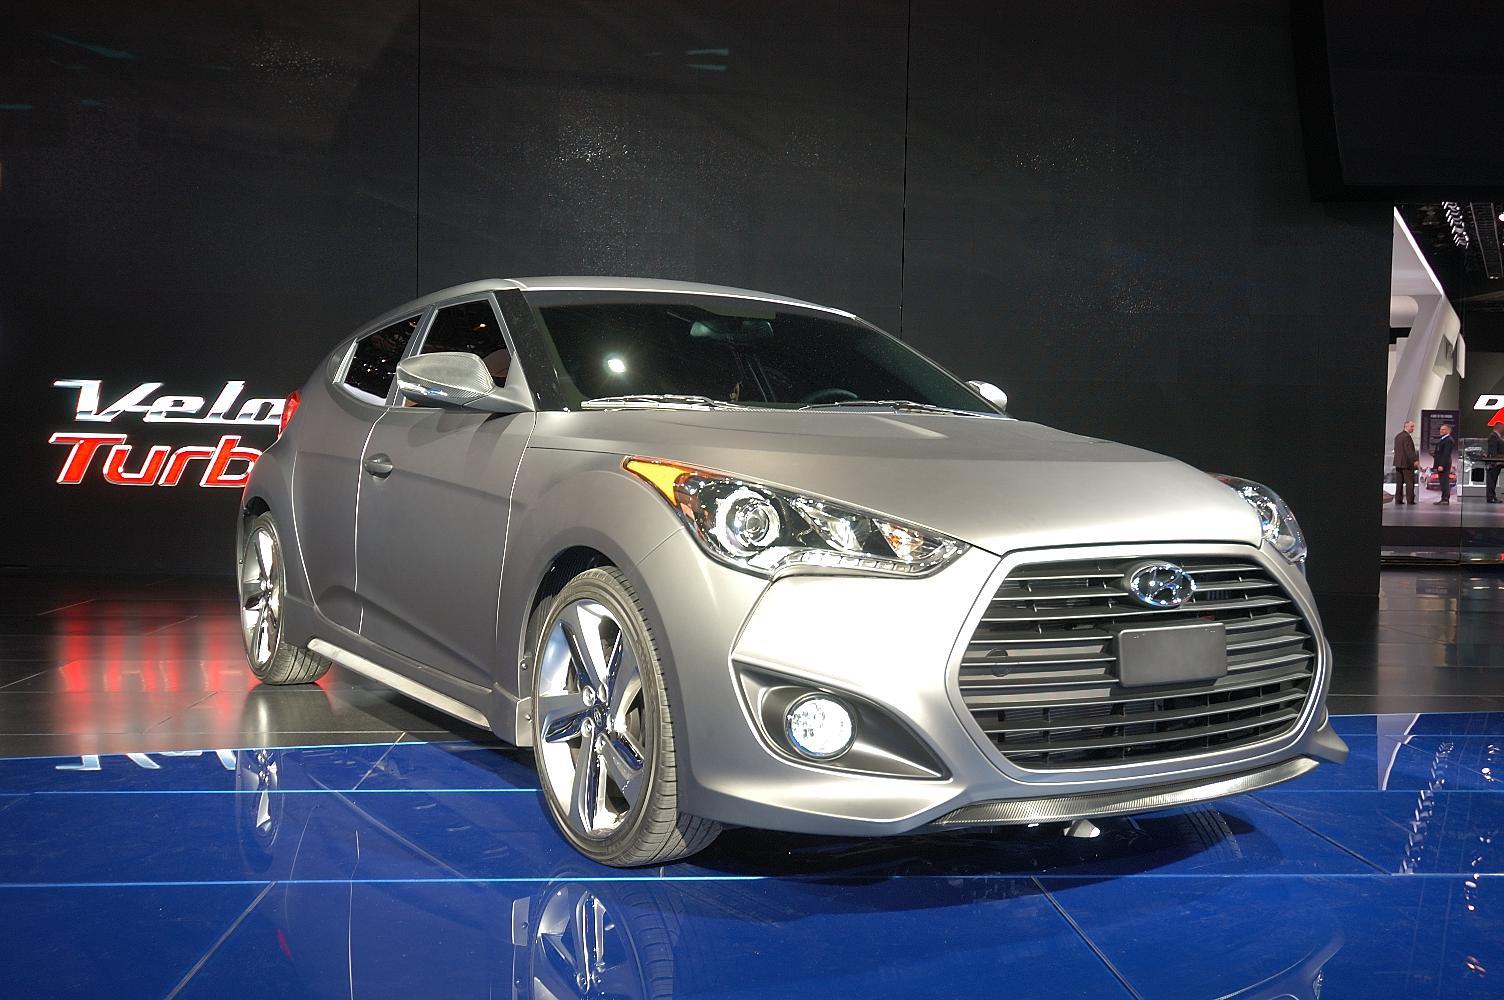 Hyundai Veloster NAIAS 2012